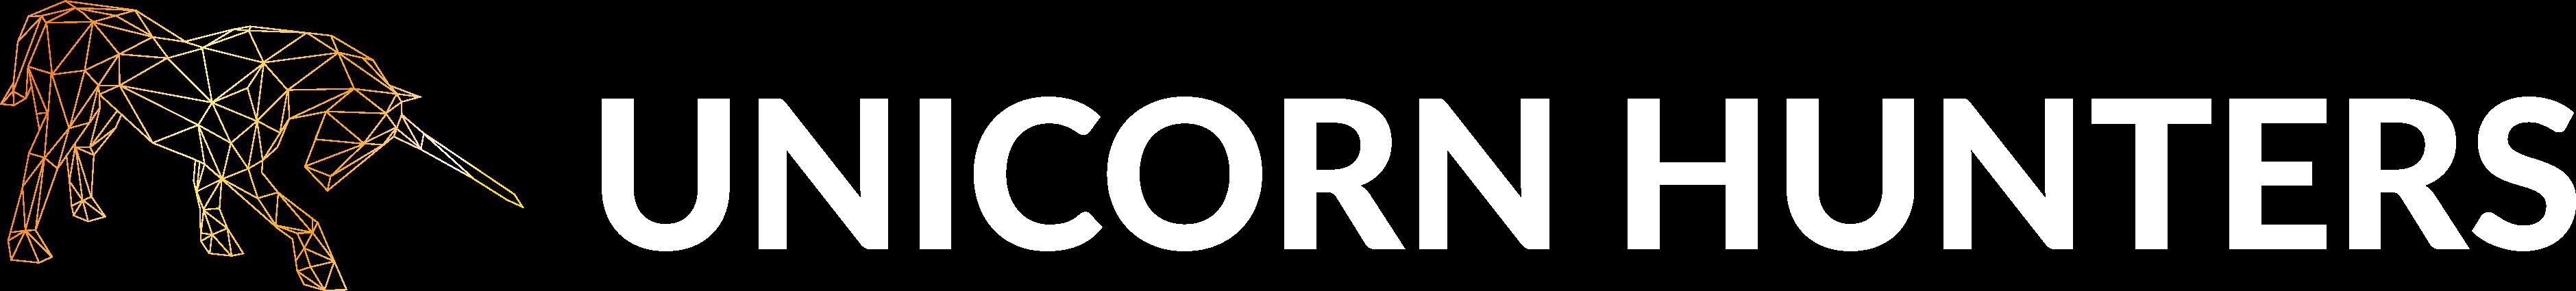 Unicorn Hunters Logo